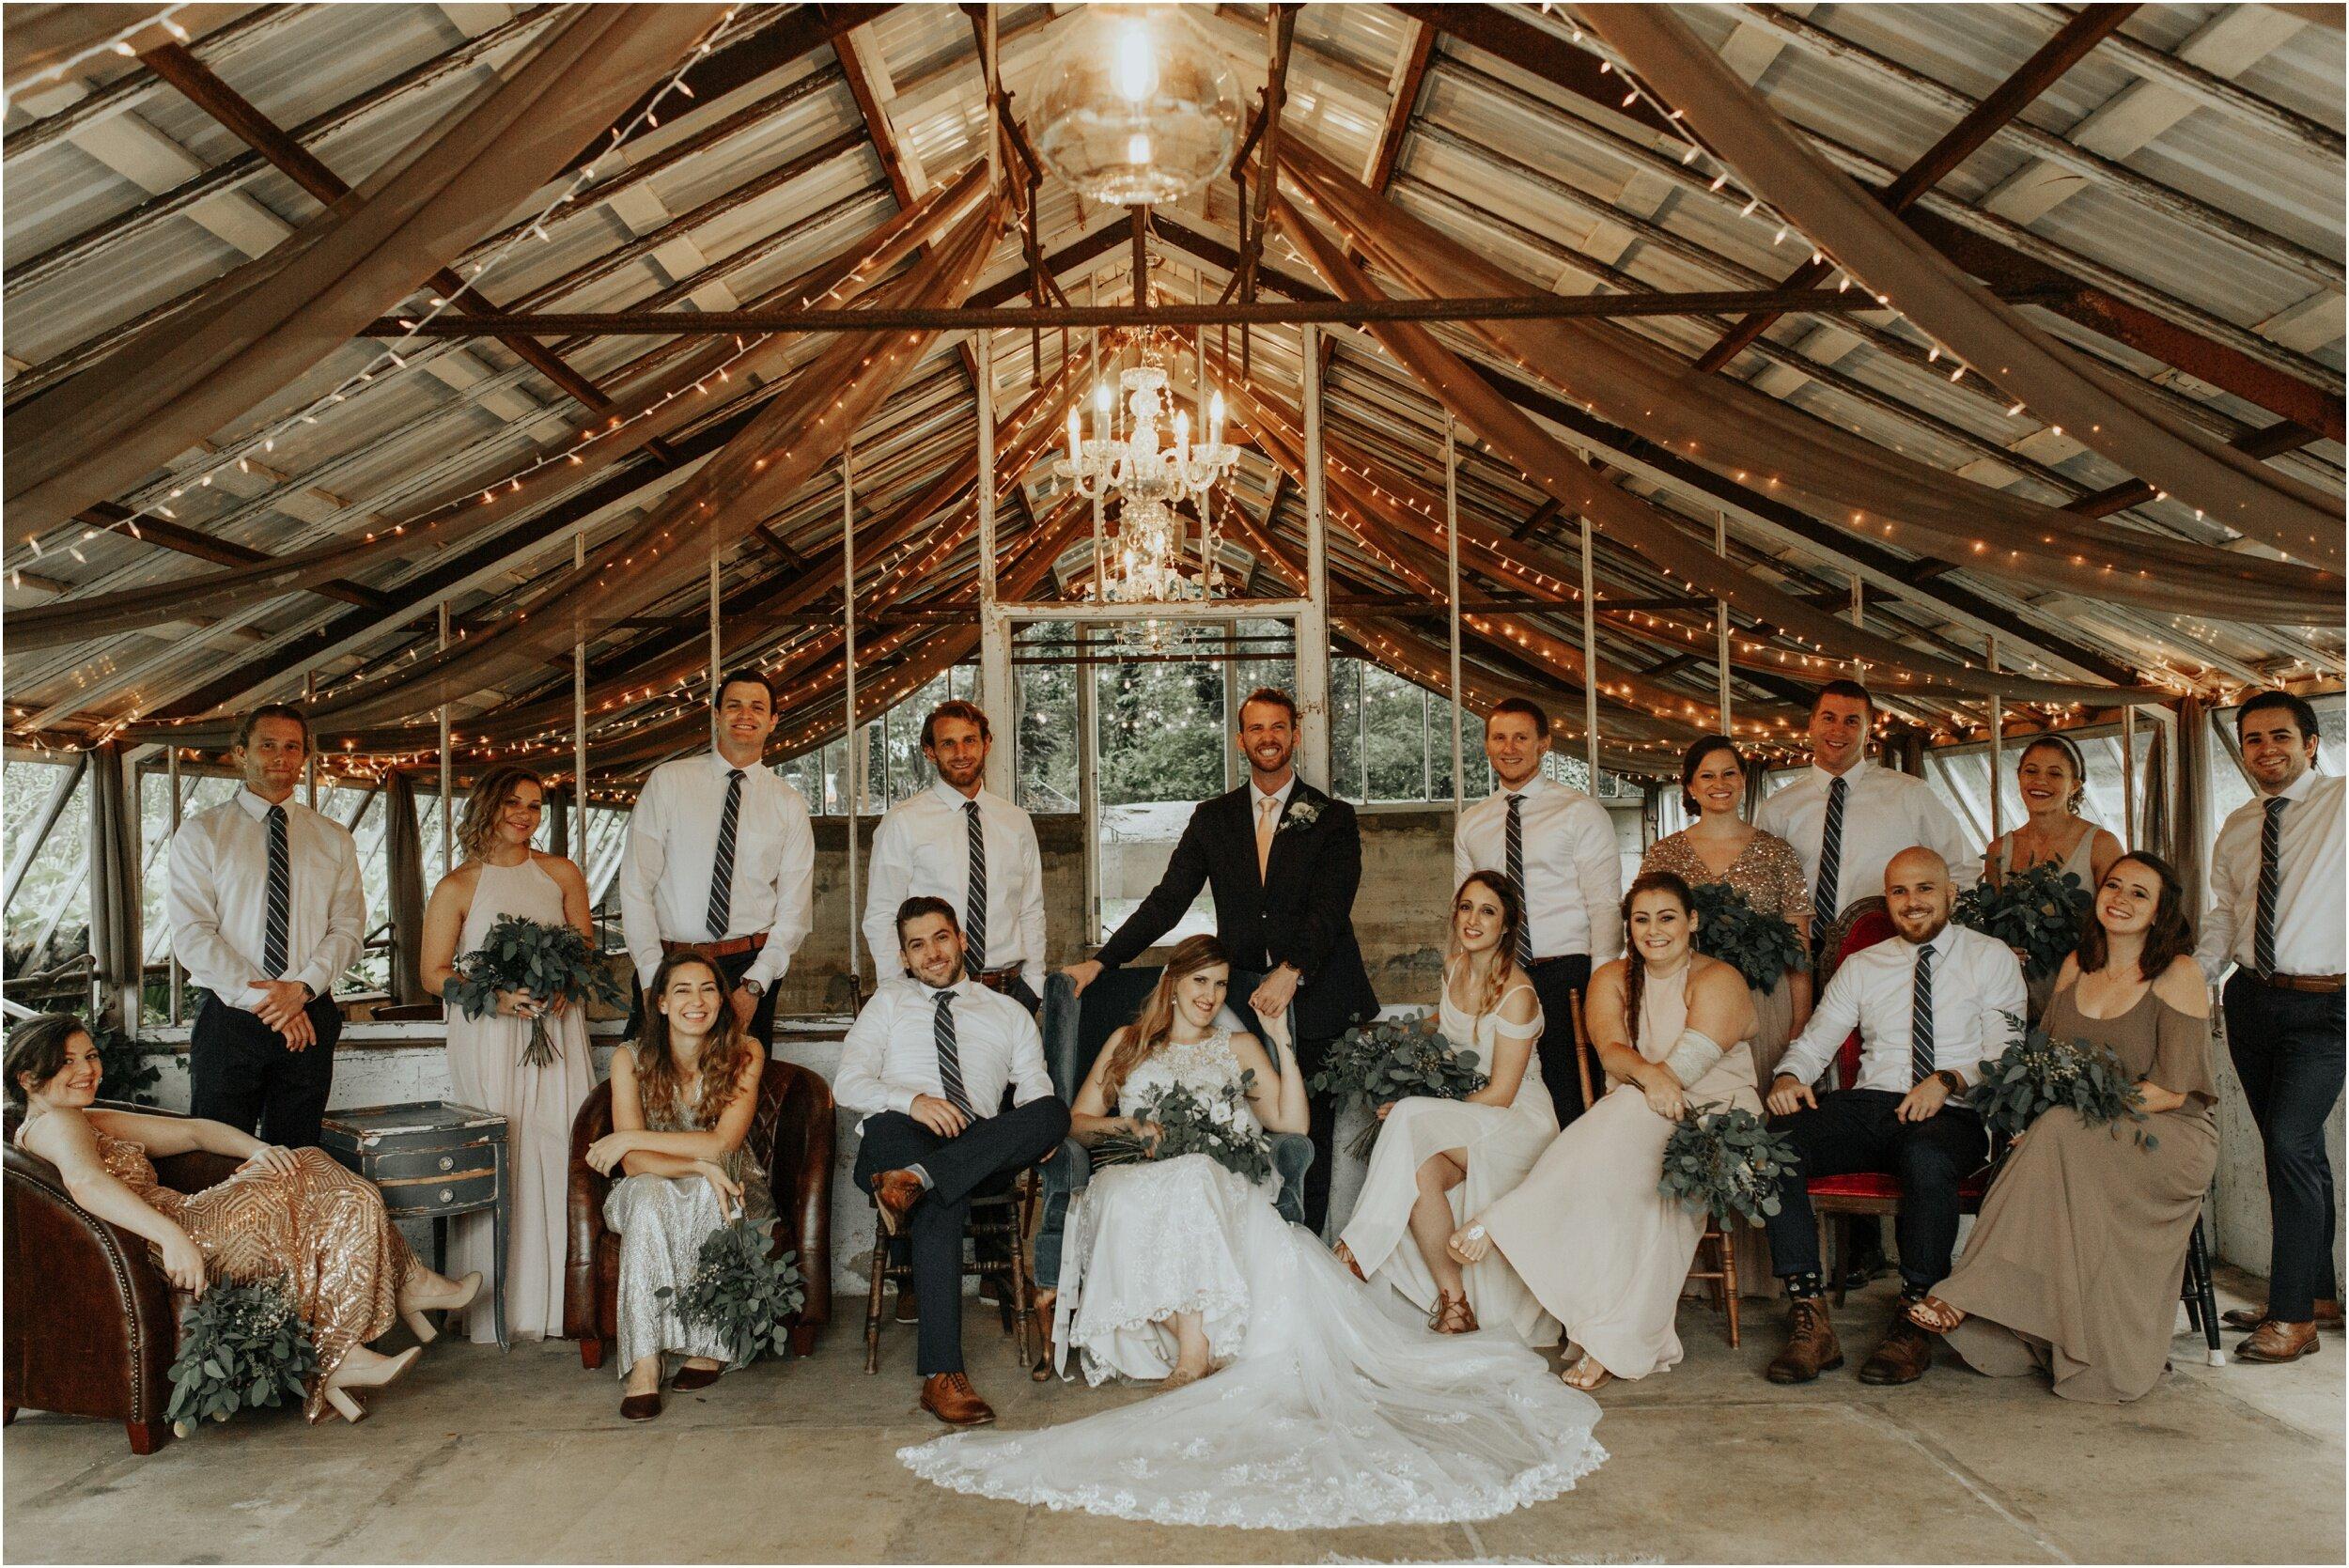 steph-and-jordan-cox-our-wedding-historic-shady-lane-compass-wedding-collective-hazel-lining-photography-destination-elopement-wedding-engagement-photography_0049.jpg